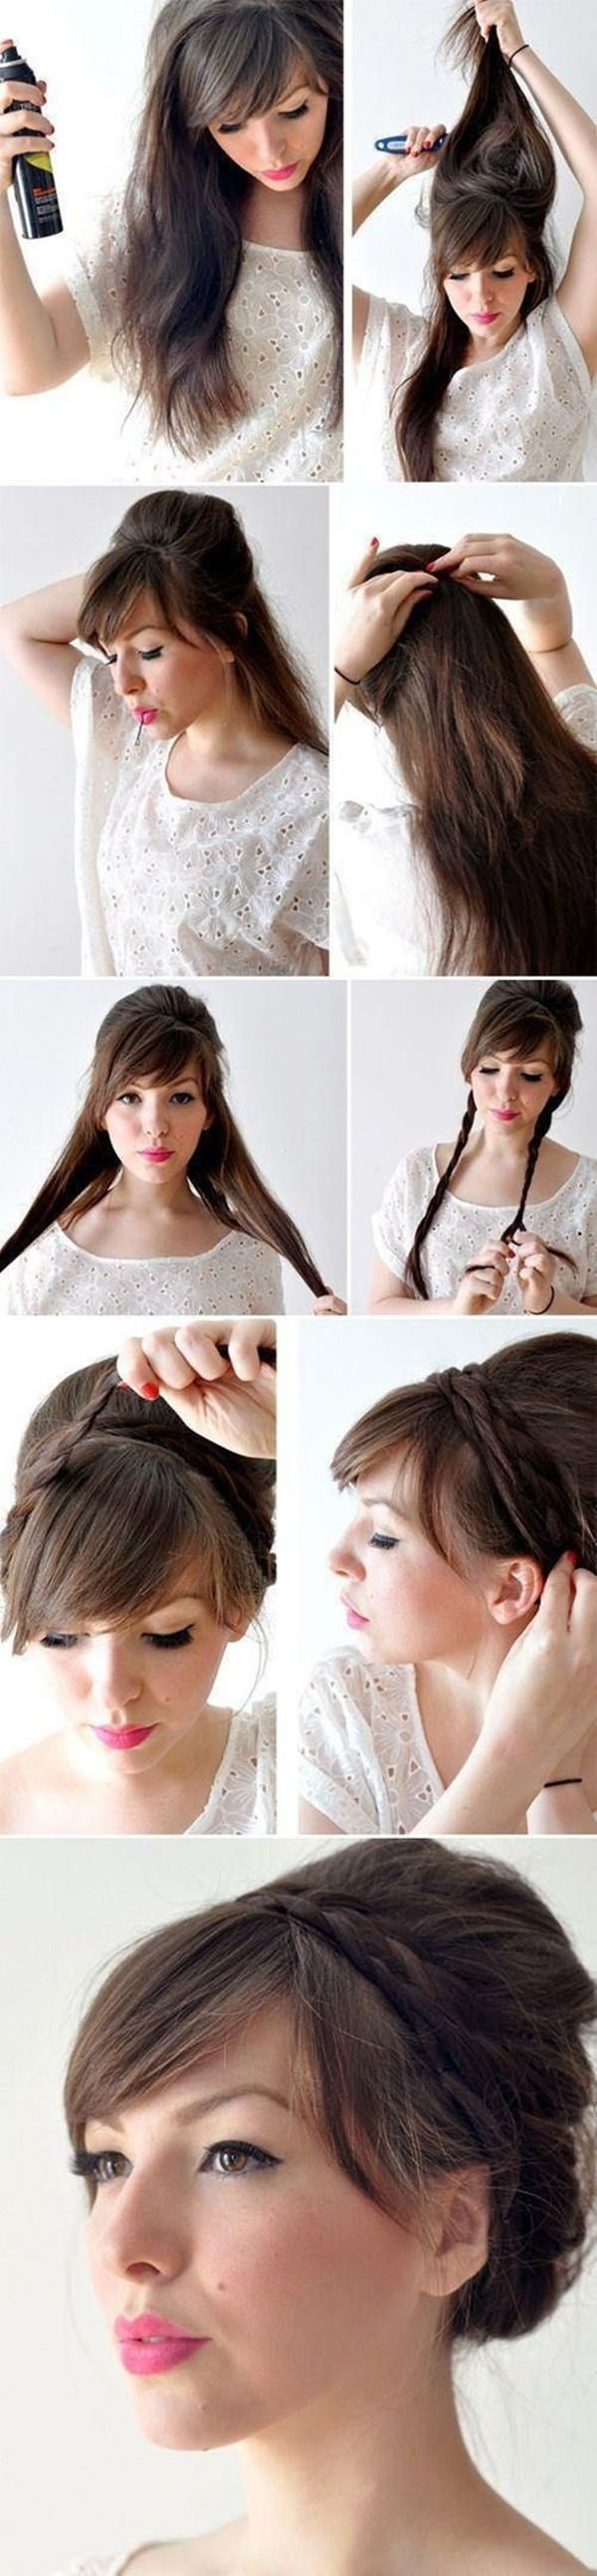 45easy-updos-for-long-hair-100416